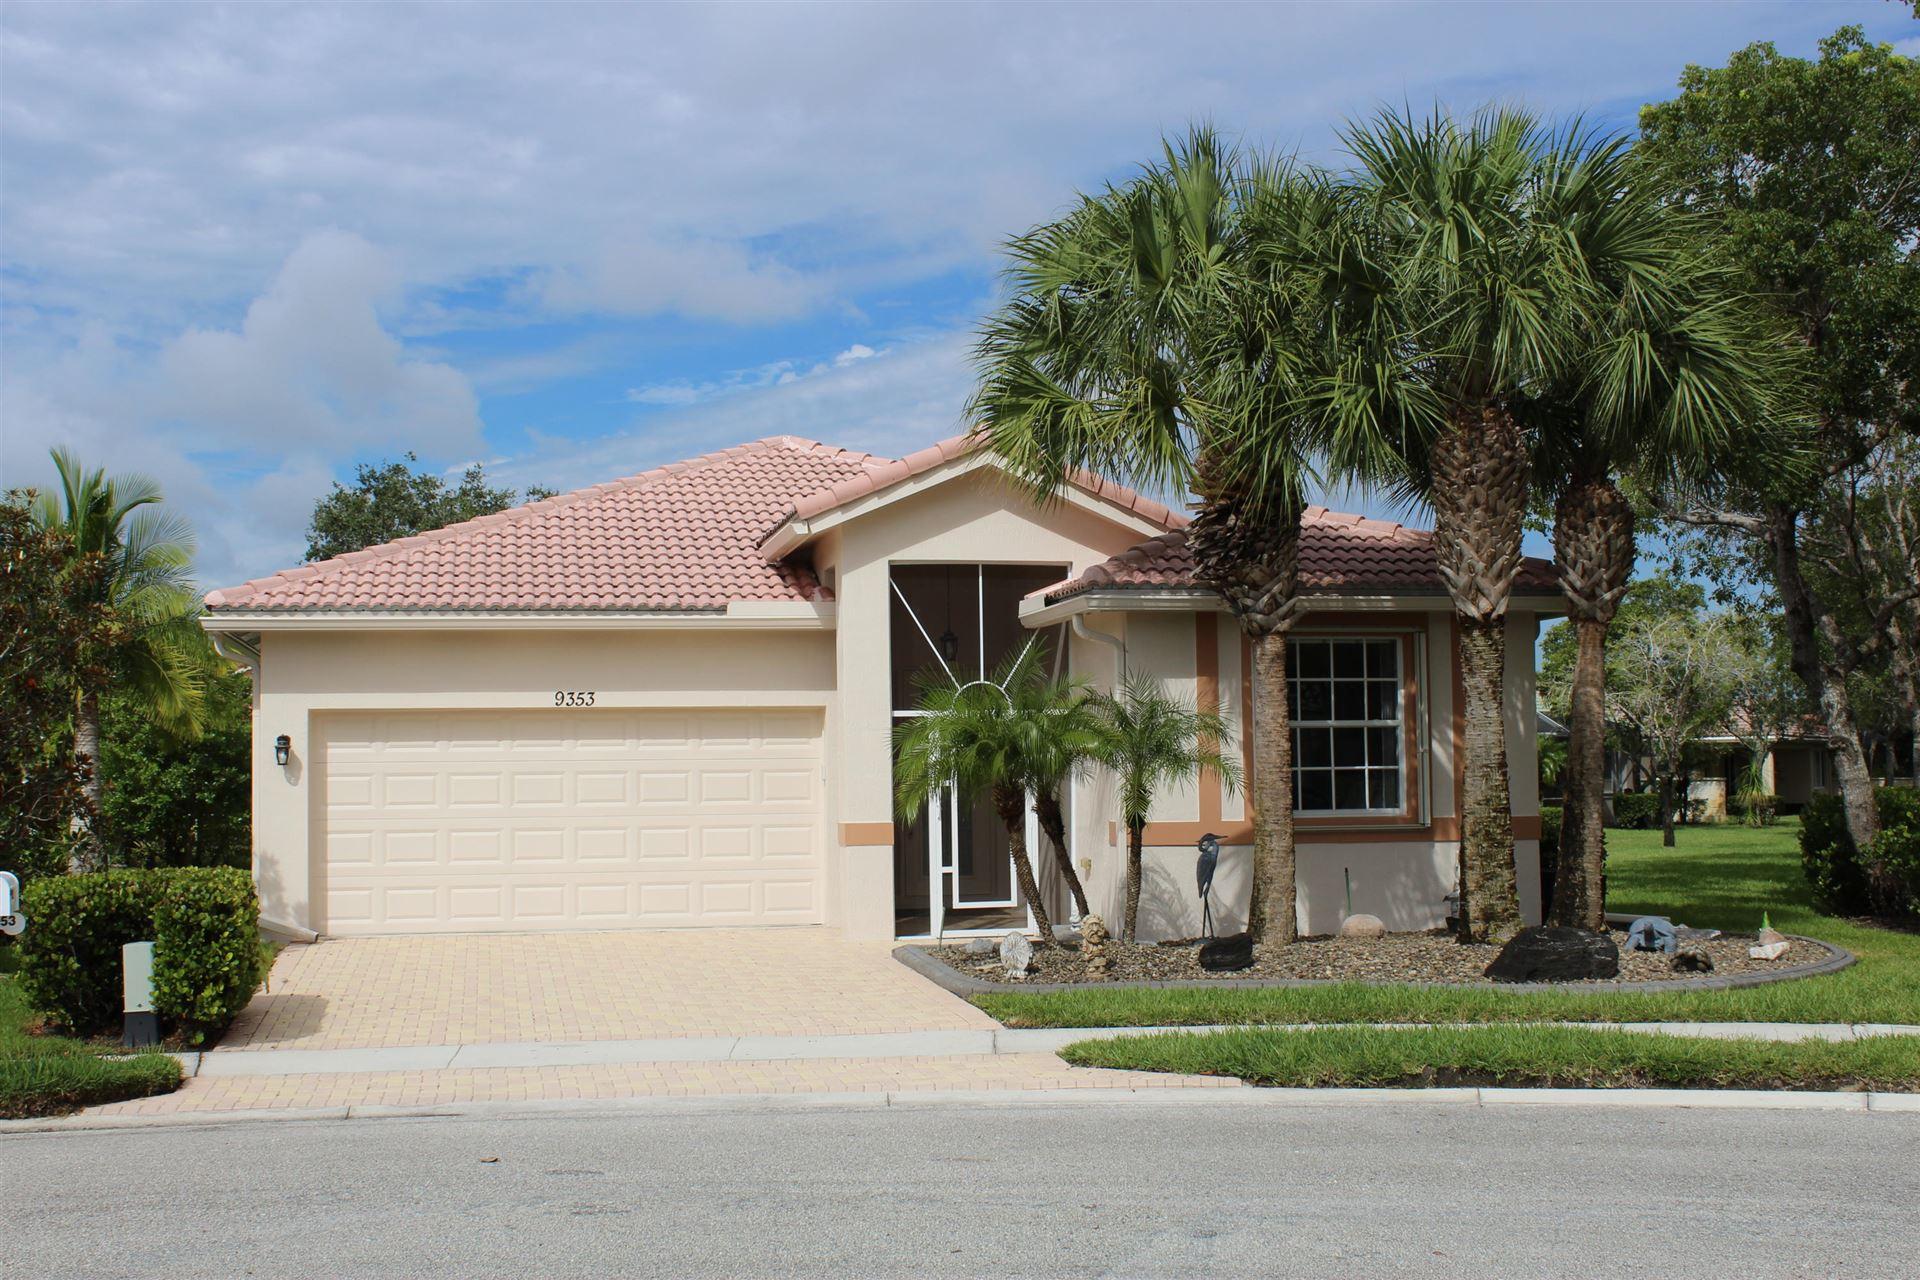 9353 Sandpiper Lane, West Palm Beach, FL 33411 - #: RX-10650900